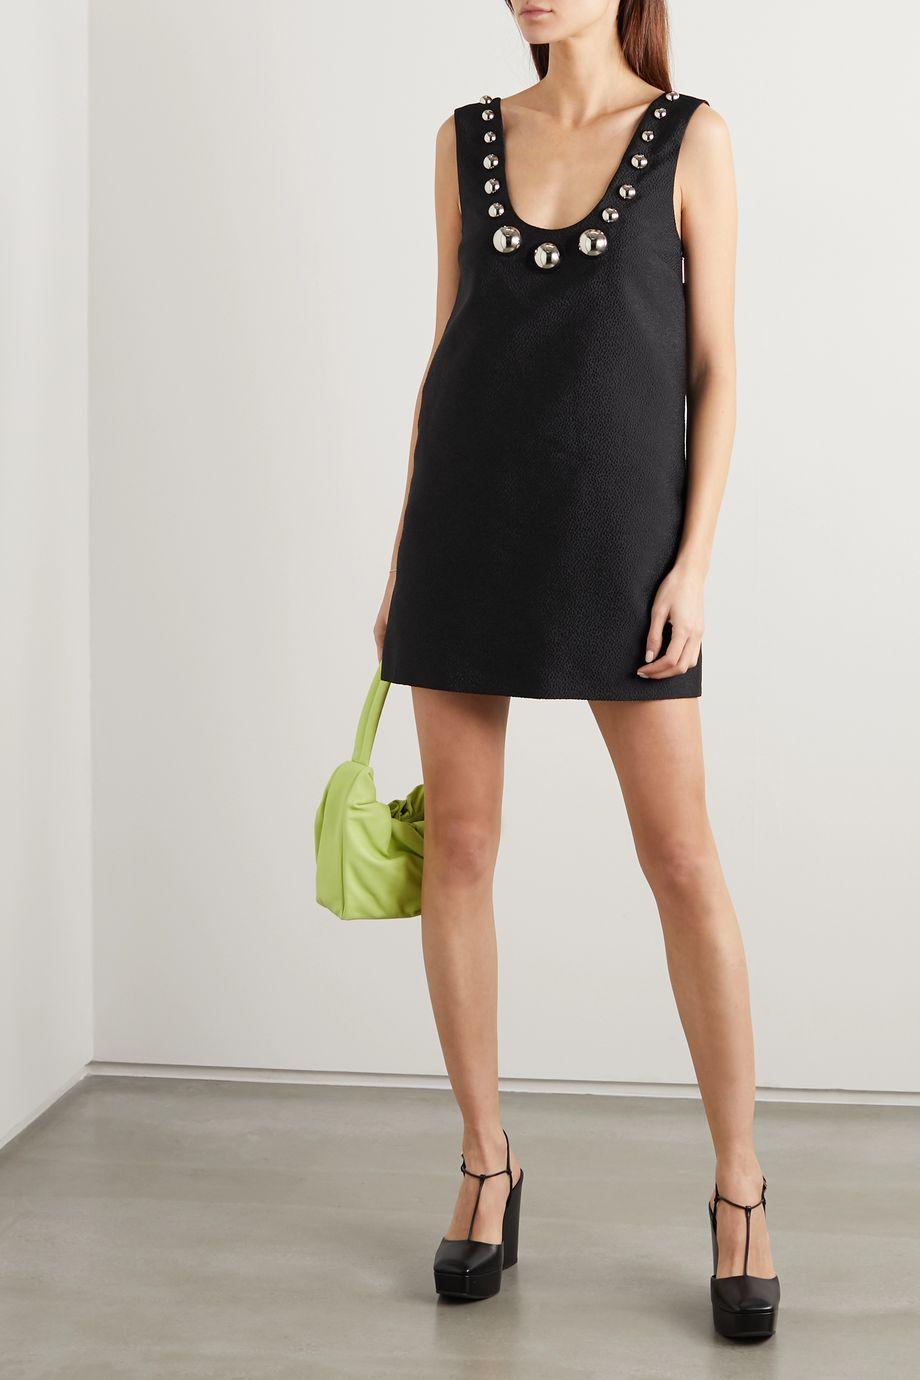 Christopher Kane Embellished jacquard mini dress